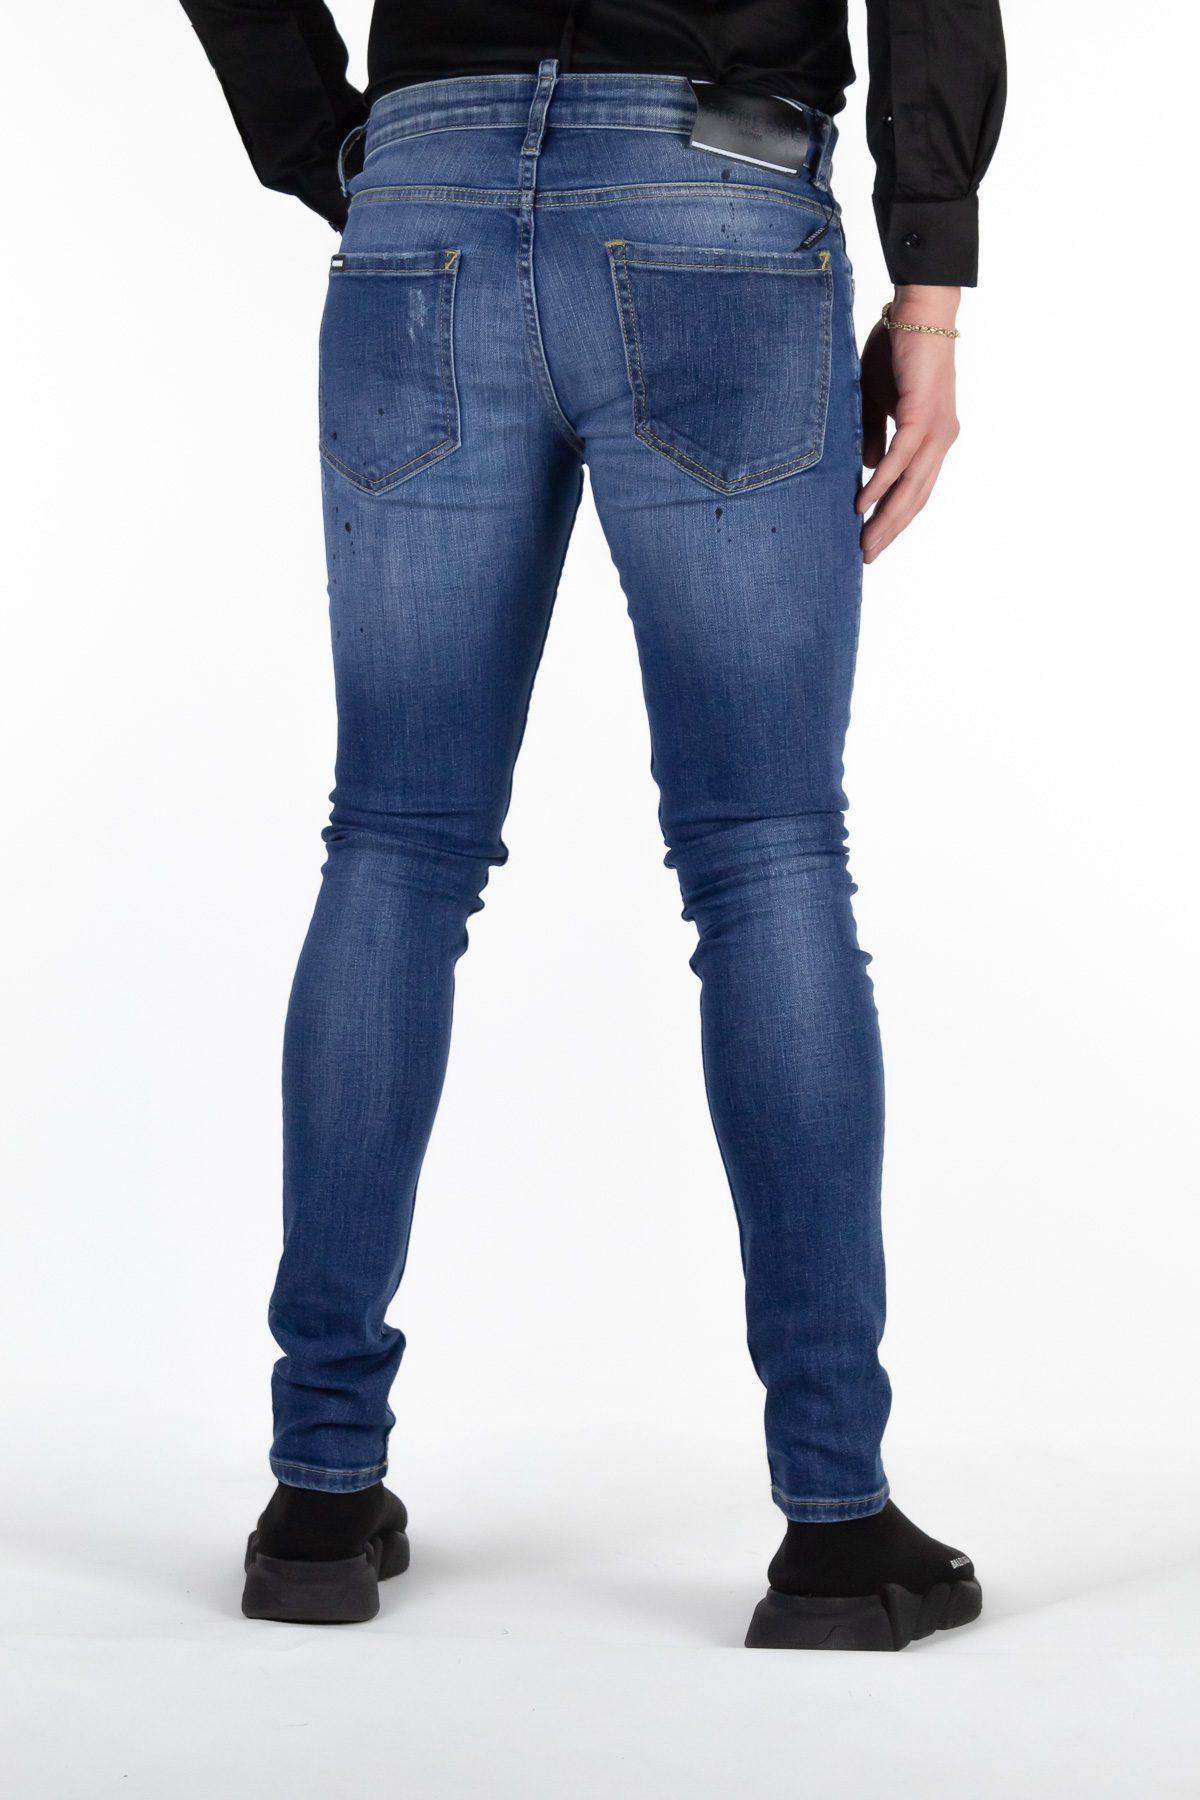 Richesse Milan Blue Jeans 2237-4